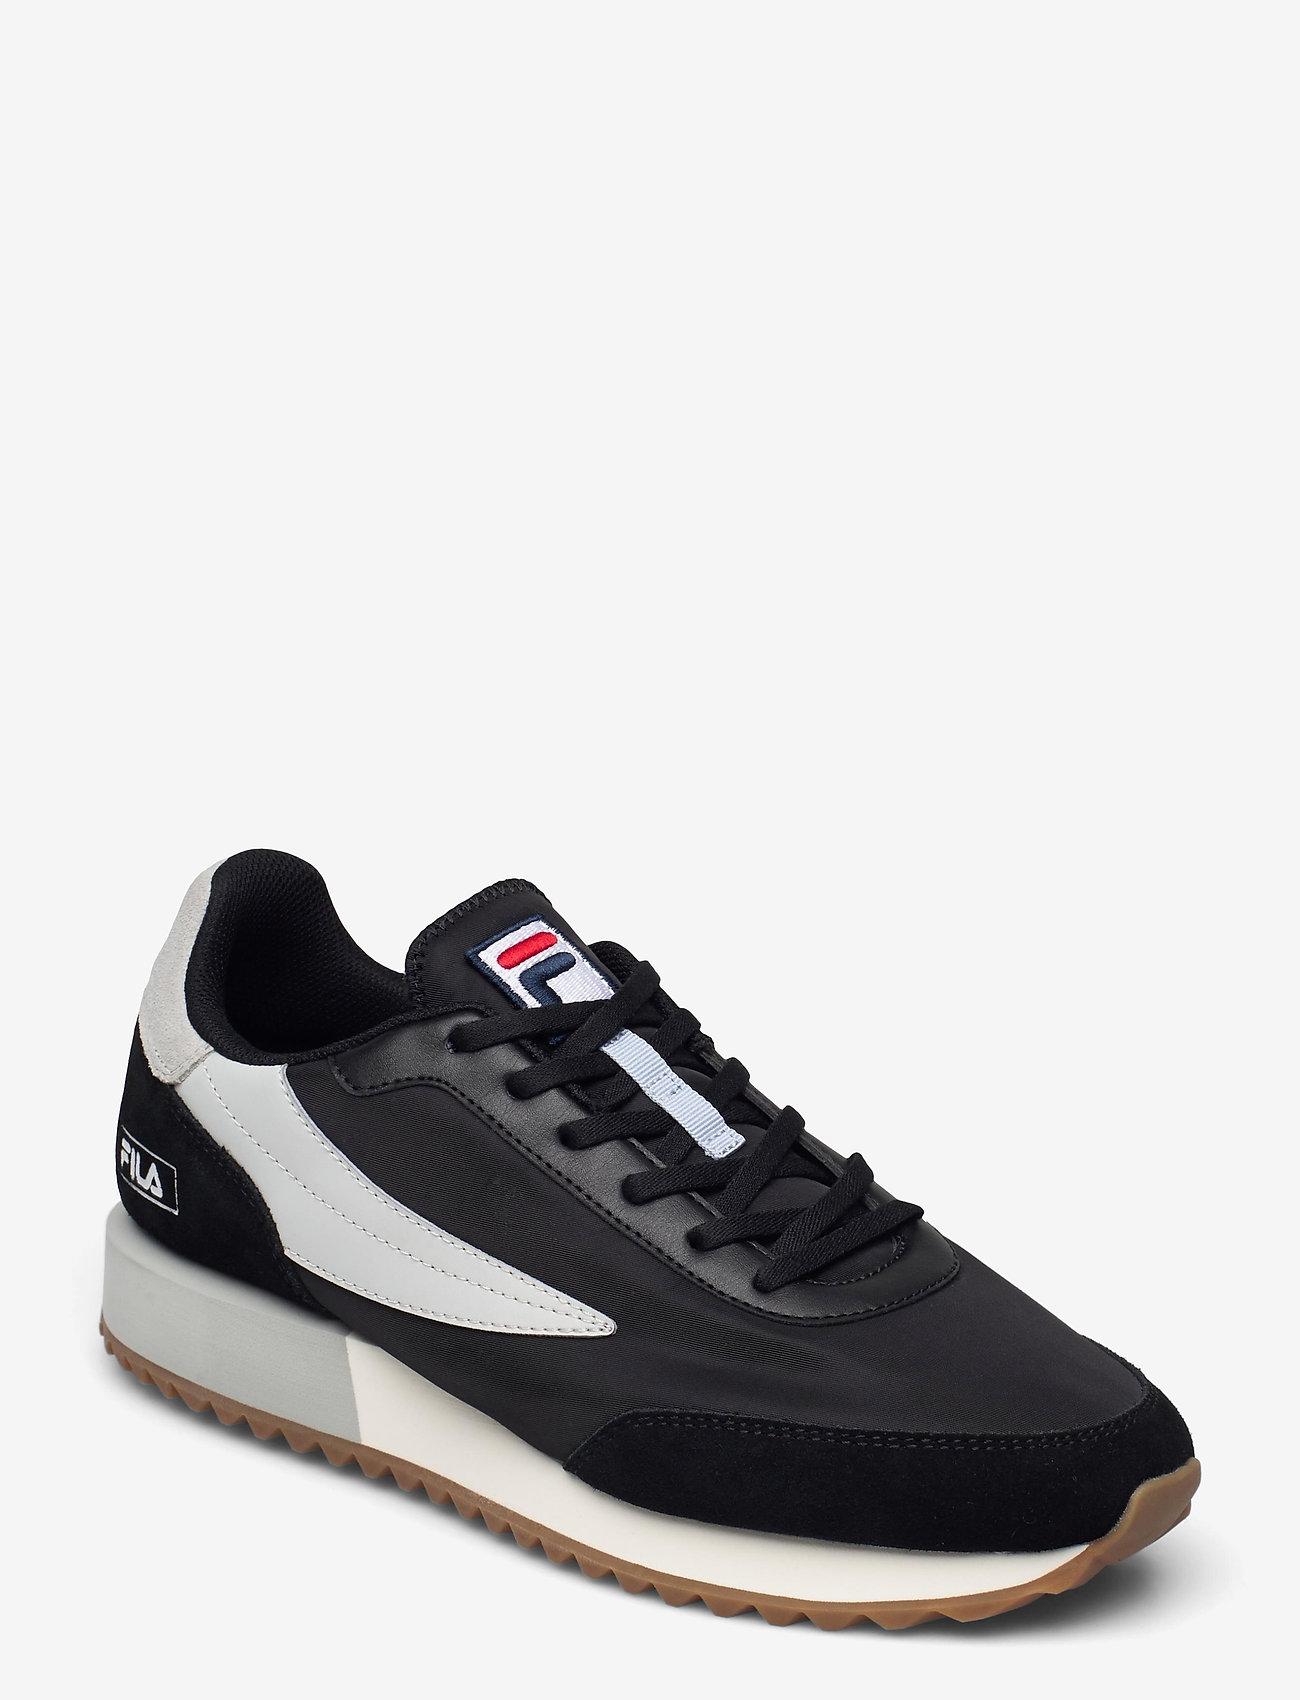 FILA - Retronique - baskets basses - black / gray violet - 0